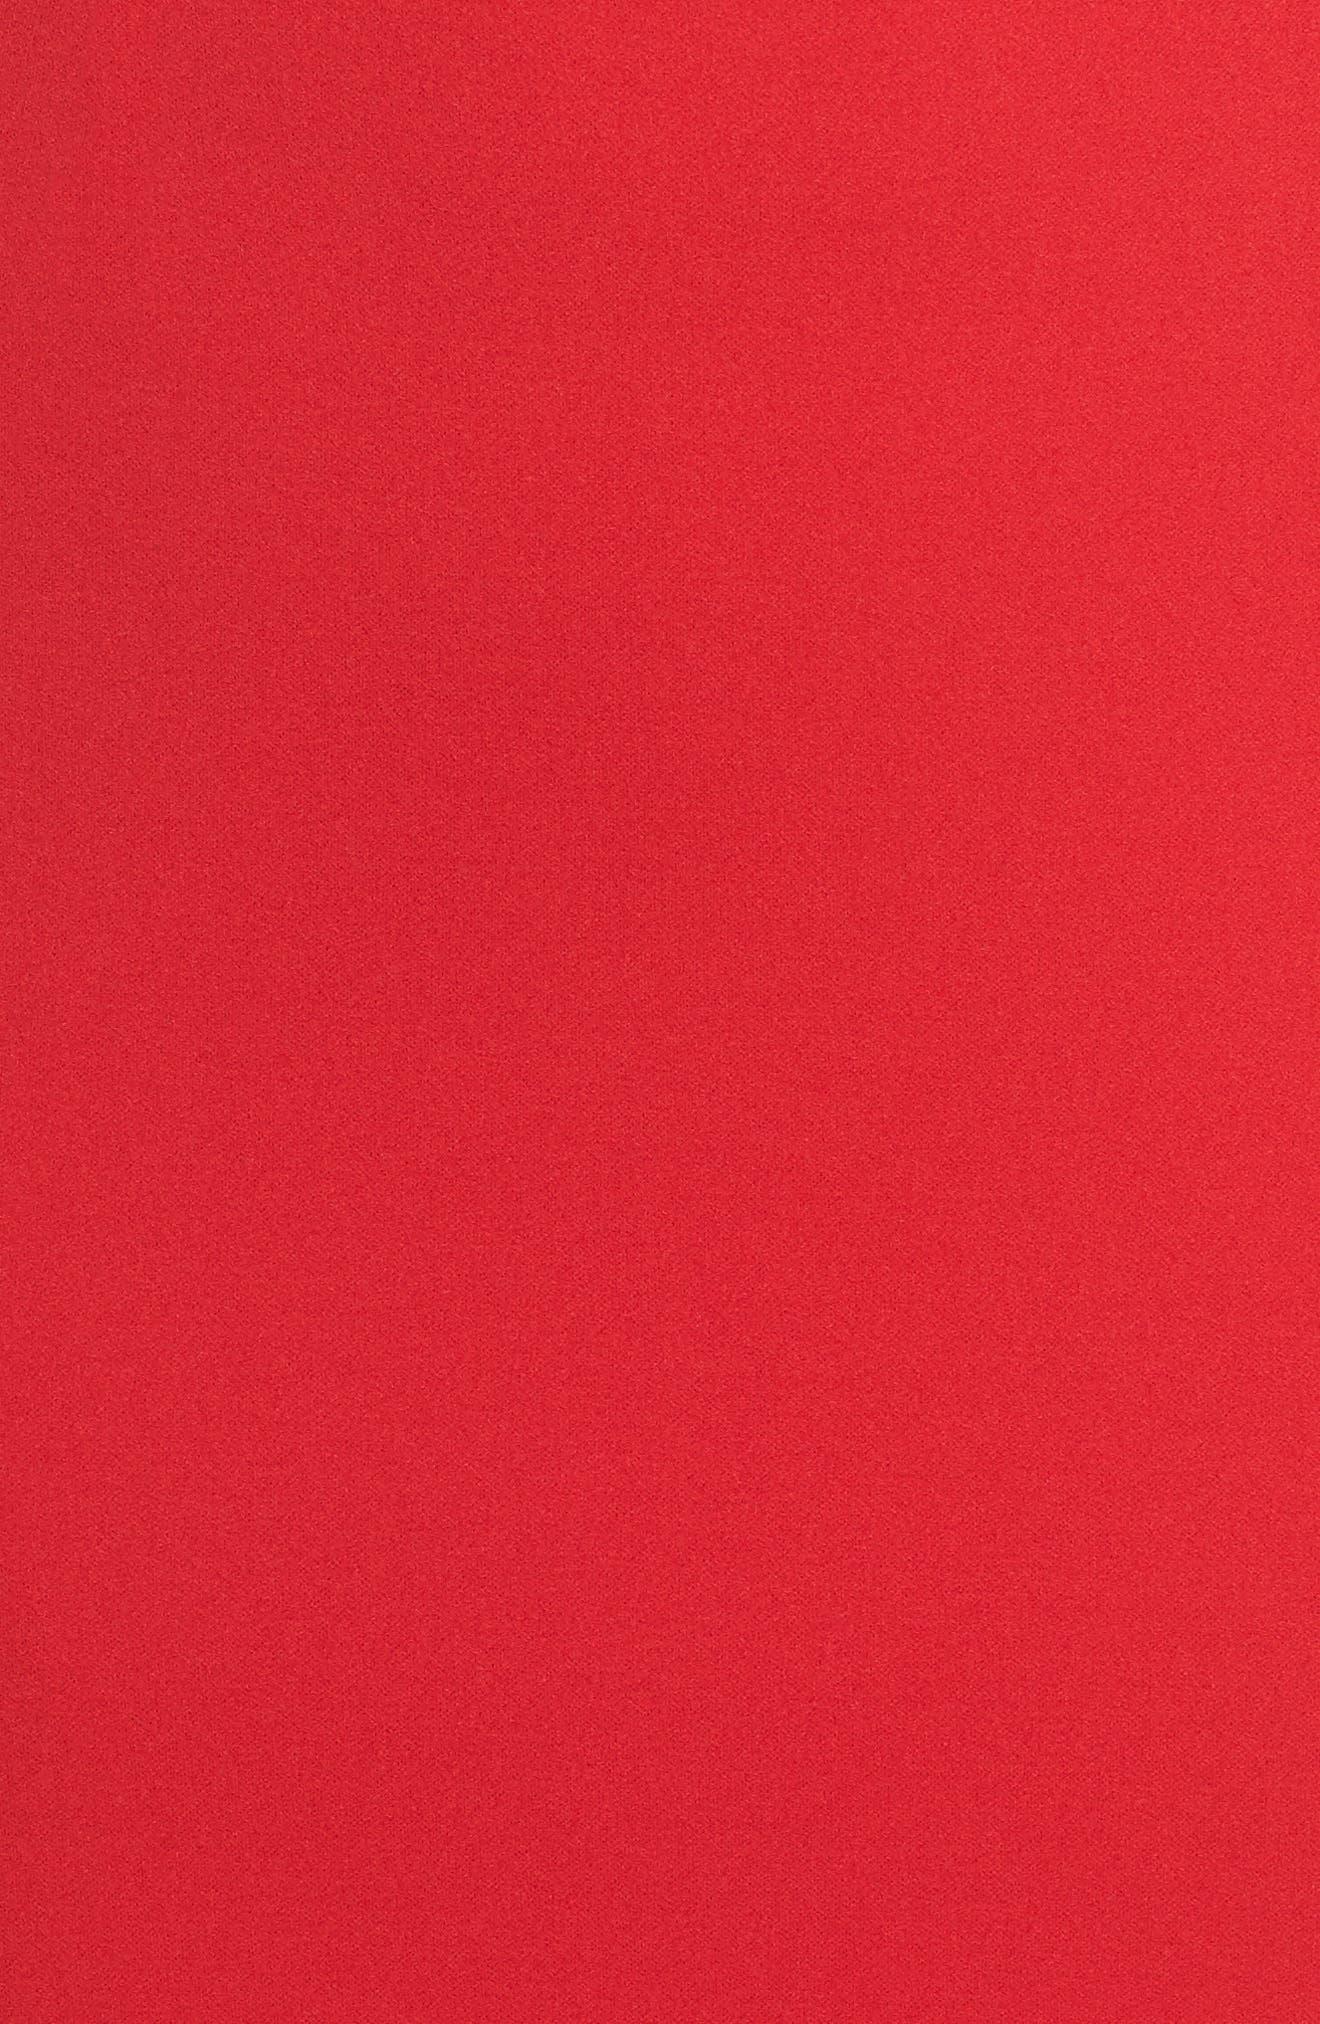 Vionnet Drape Back Crepe Gown,                             Alternate thumbnail 5, color,                             Red